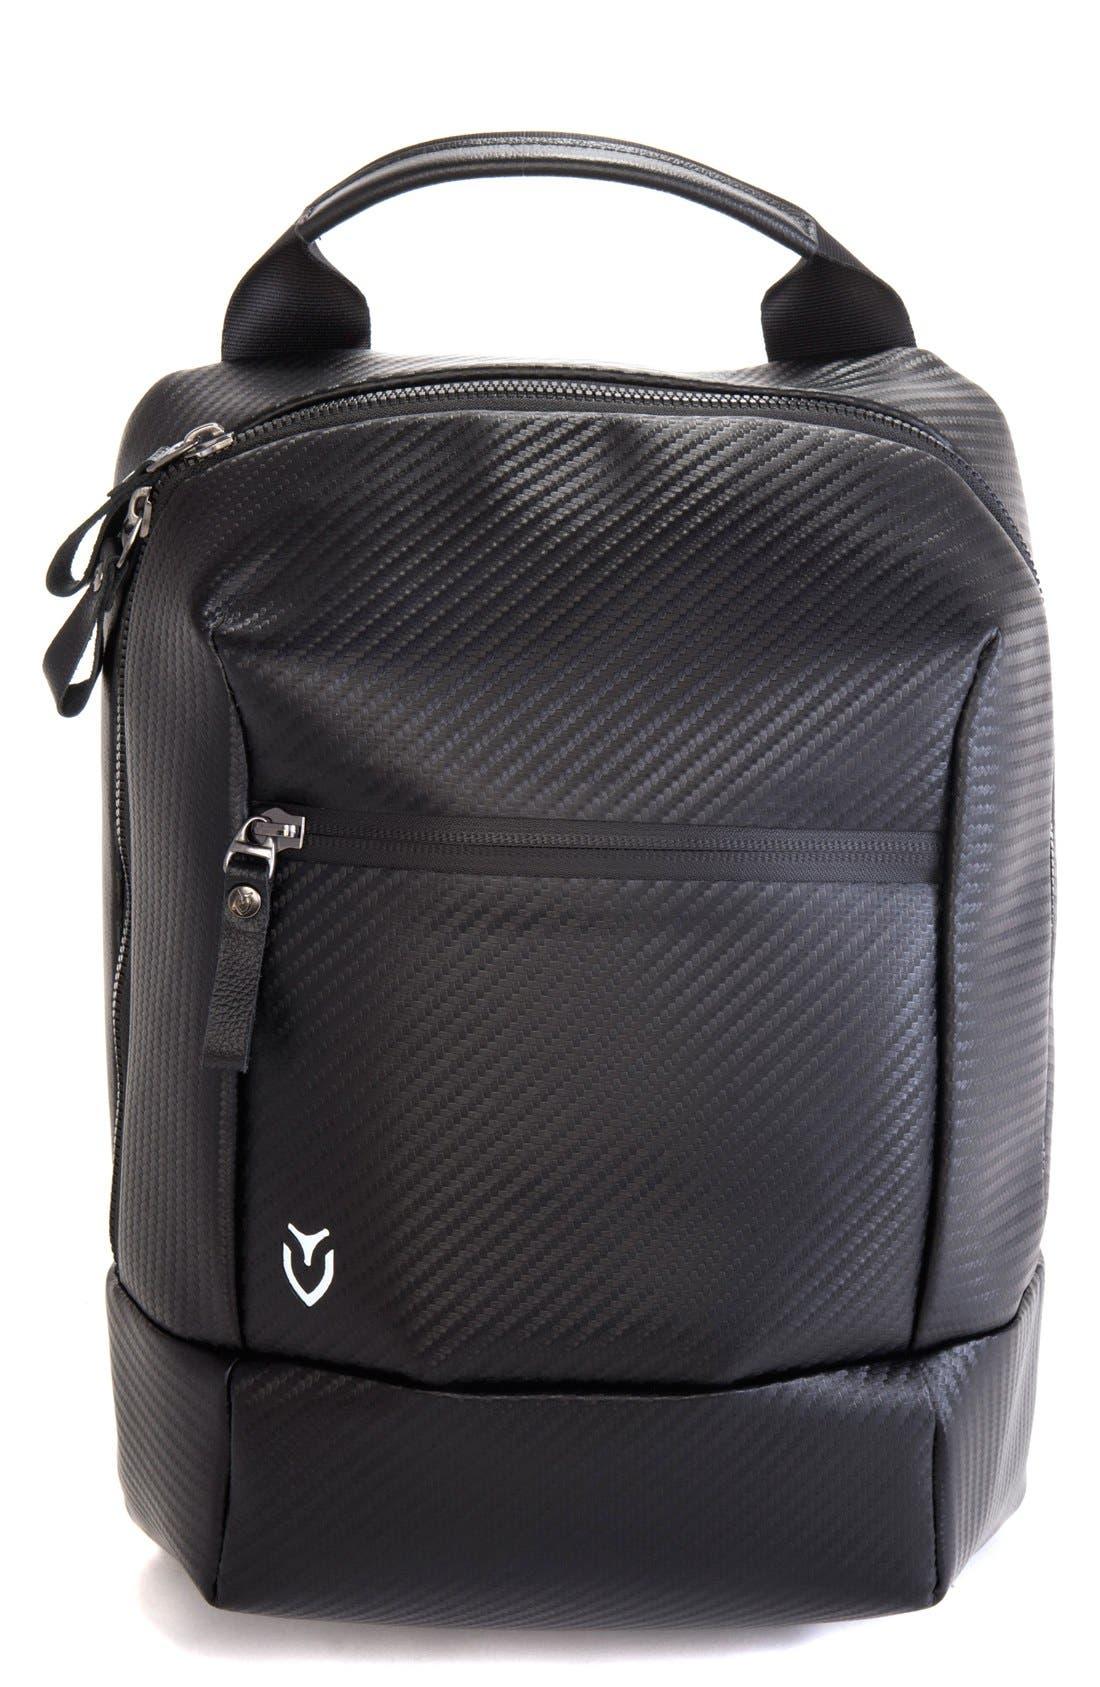 Alternate Image 1 Selected - Vessel Pebbled Faux Leather Shoe Bag